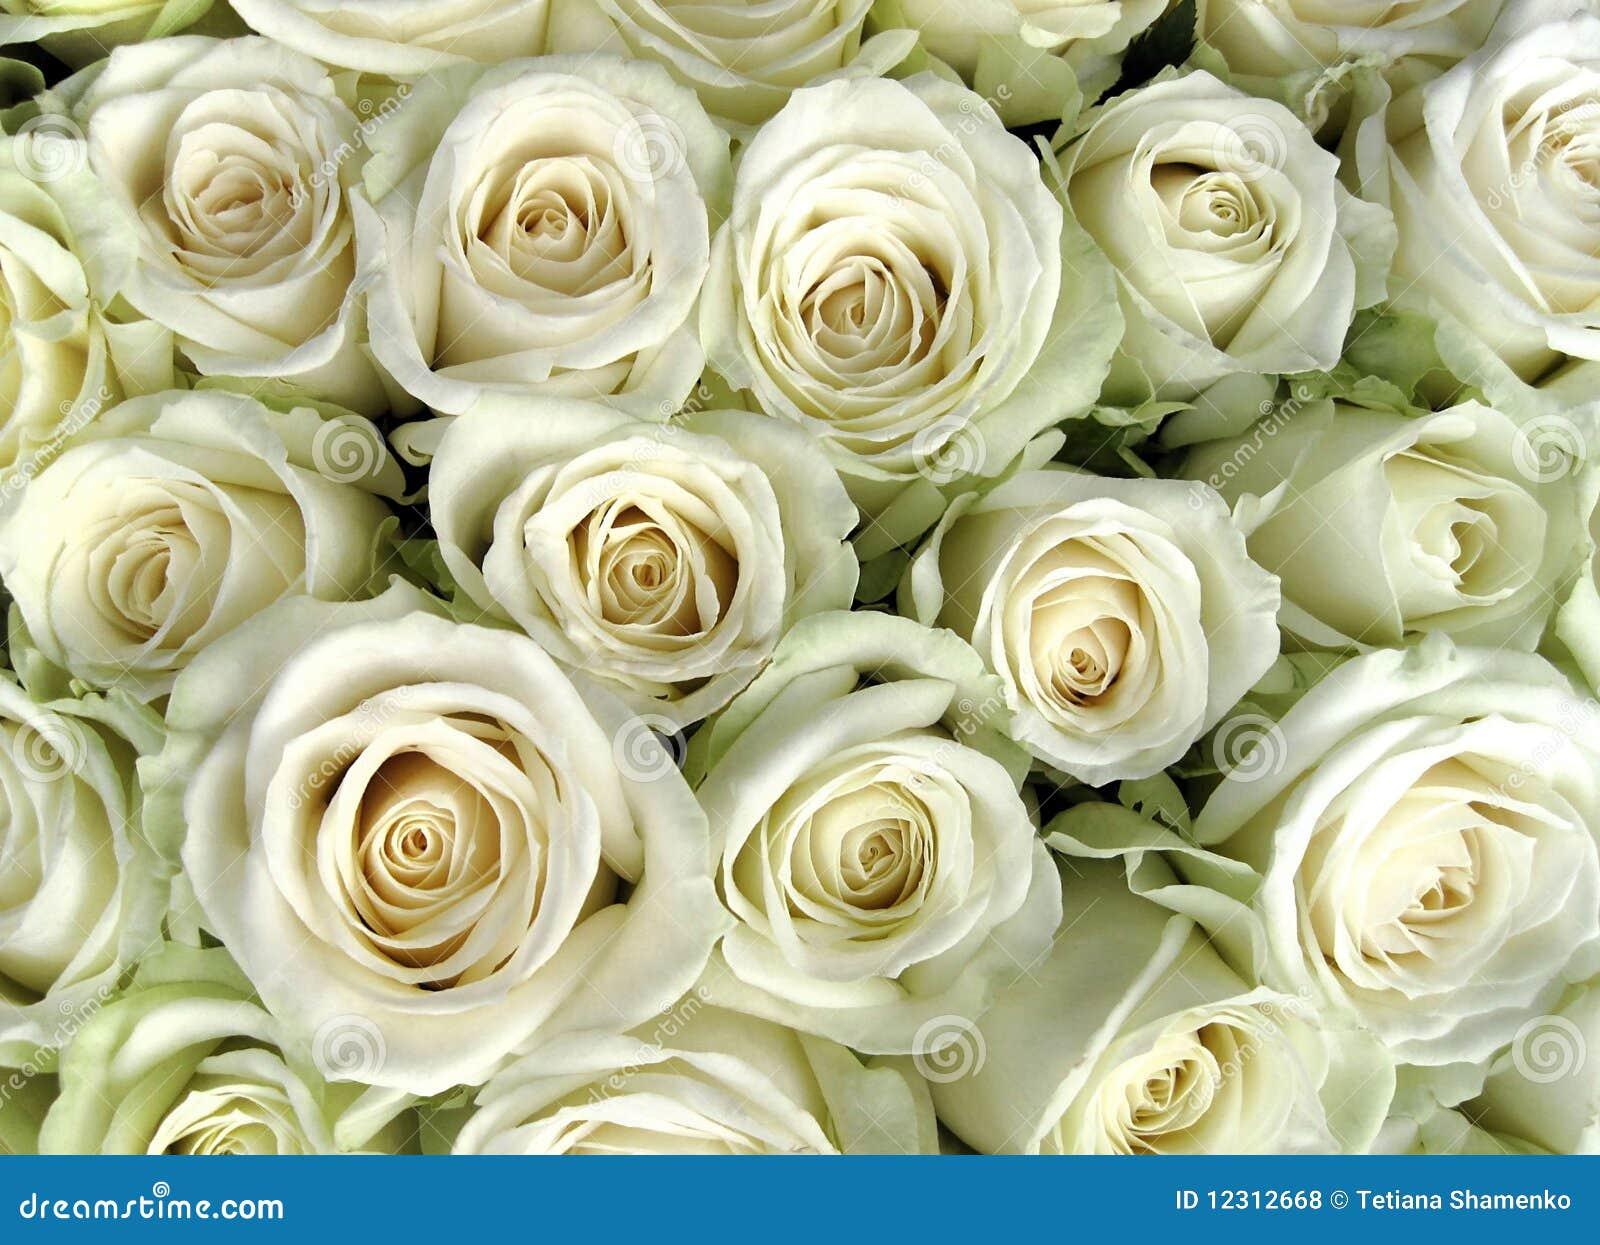 White Roses Stock Photo Image Of Rose Focus Background